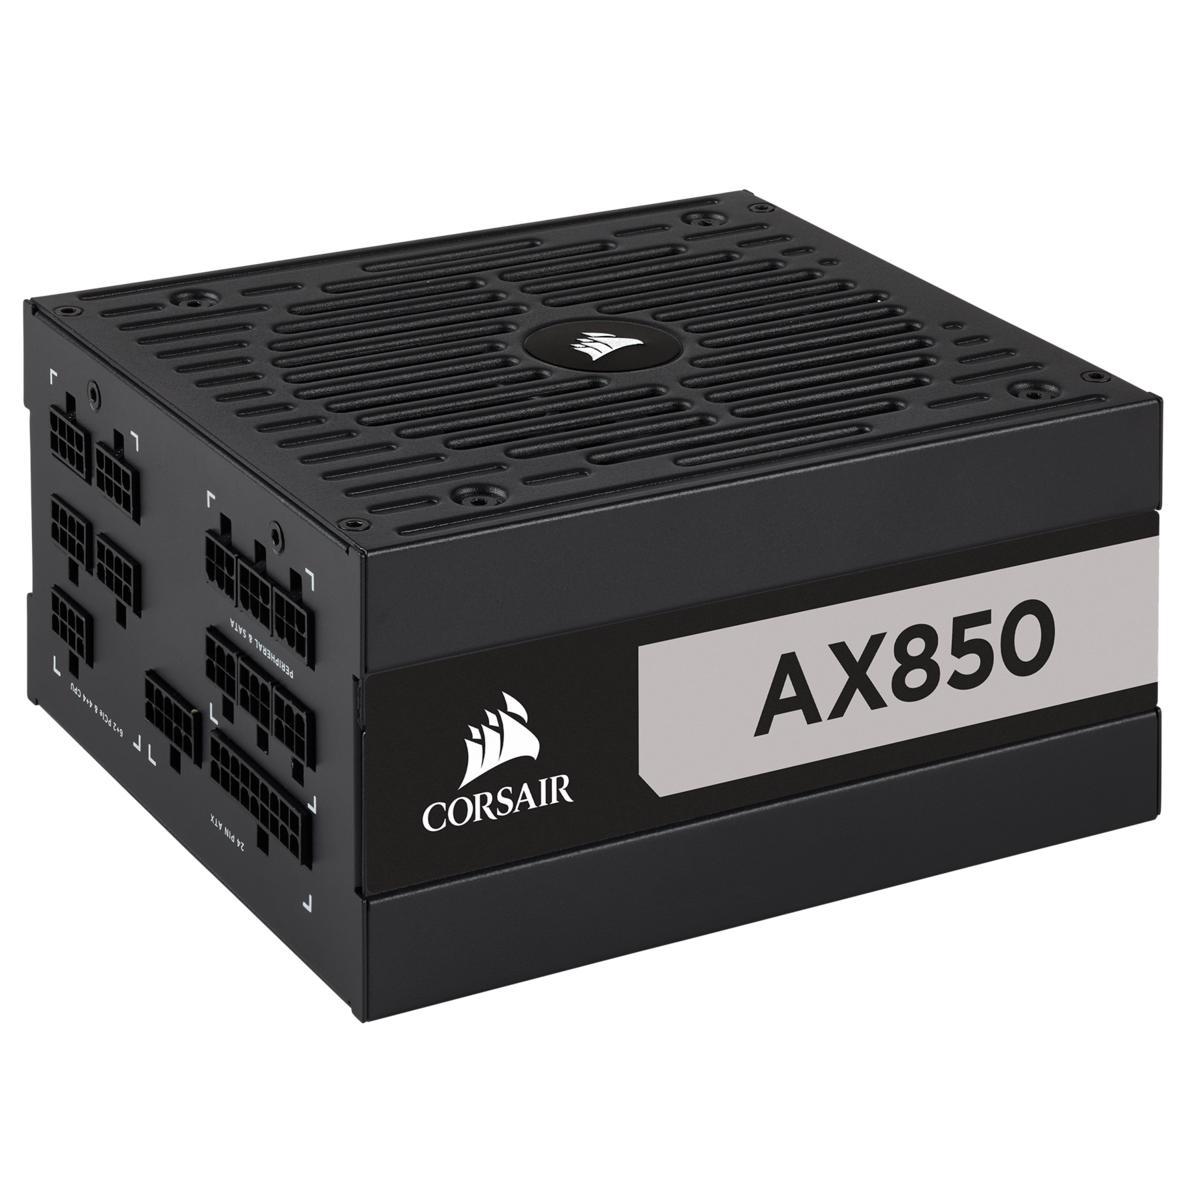 Corsair AX 850 W 80+ Titanium Certified Fully Modular ATX Power Supply